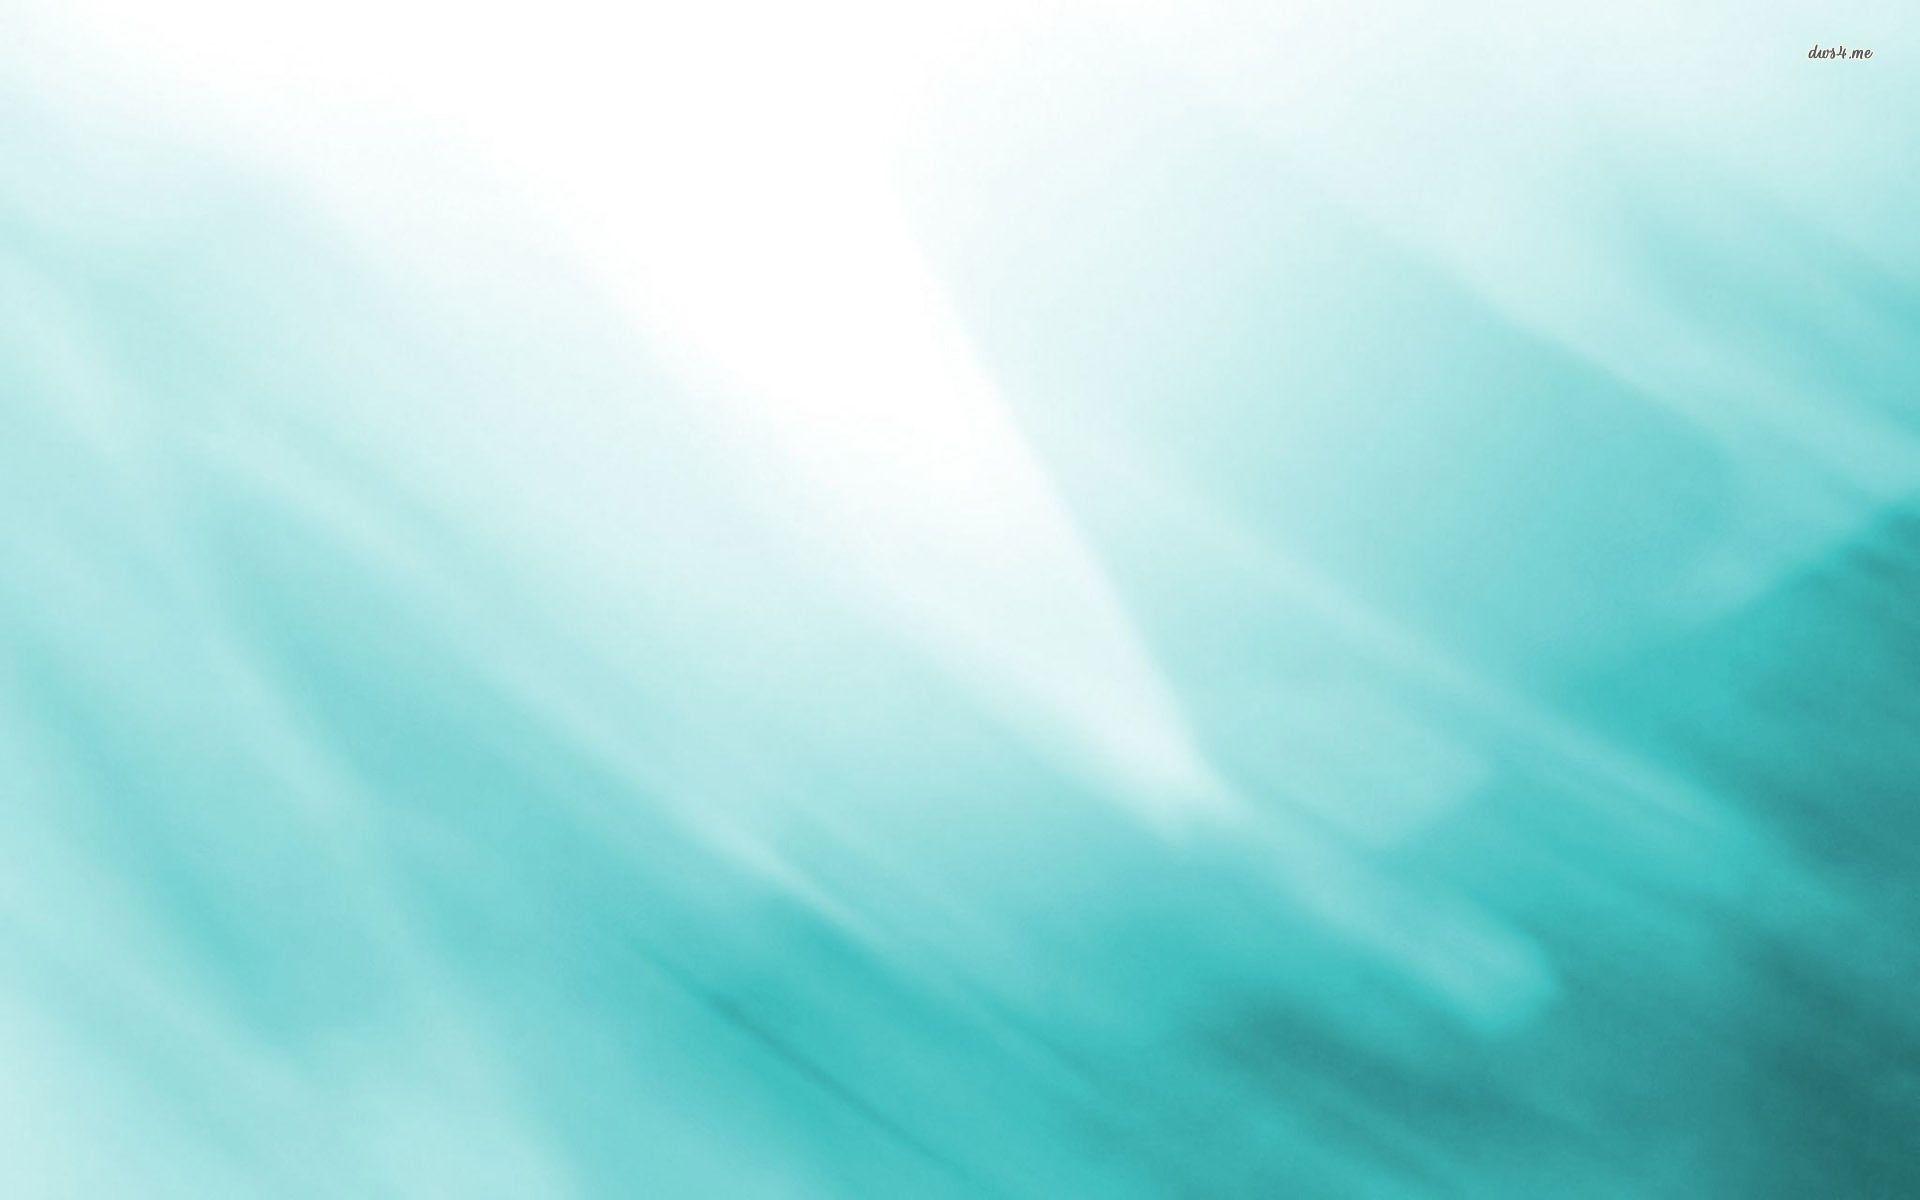 Light blue gradient wallpaper – Abstract wallpapers – #27081